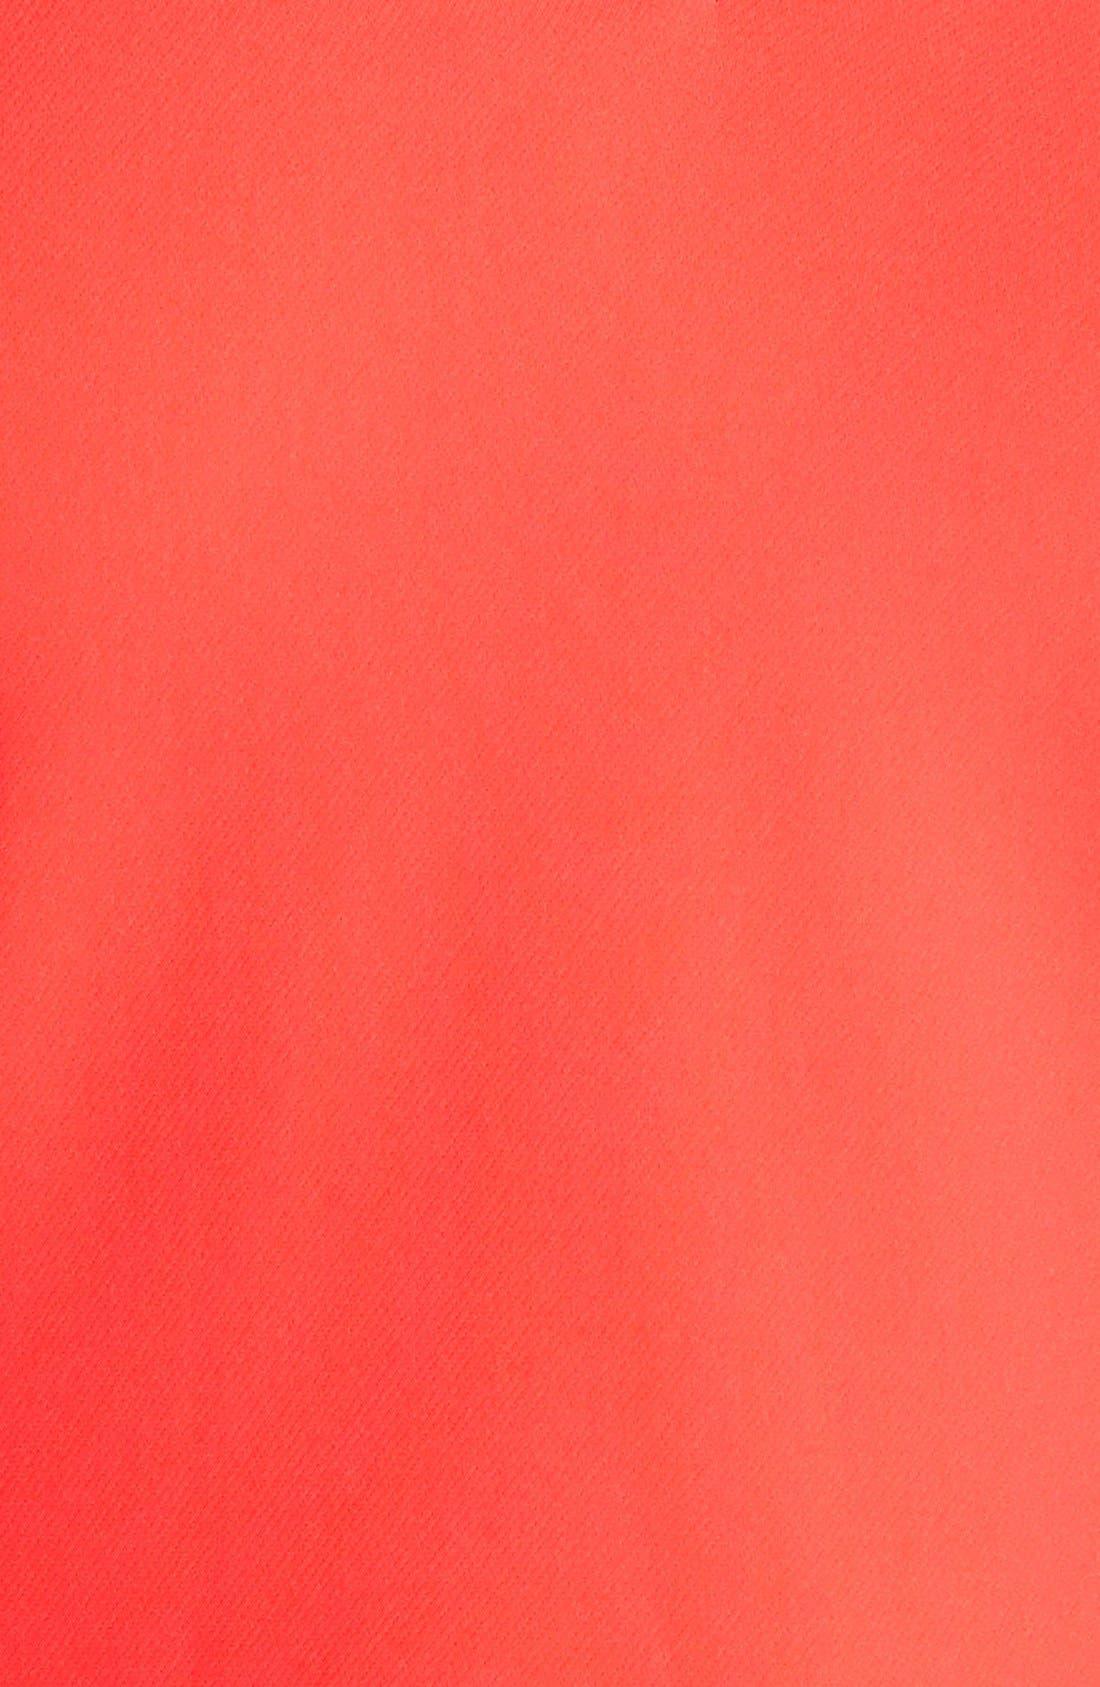 Bianca Back Cutout Fit & Flare Dress,                             Alternate thumbnail 44, color,